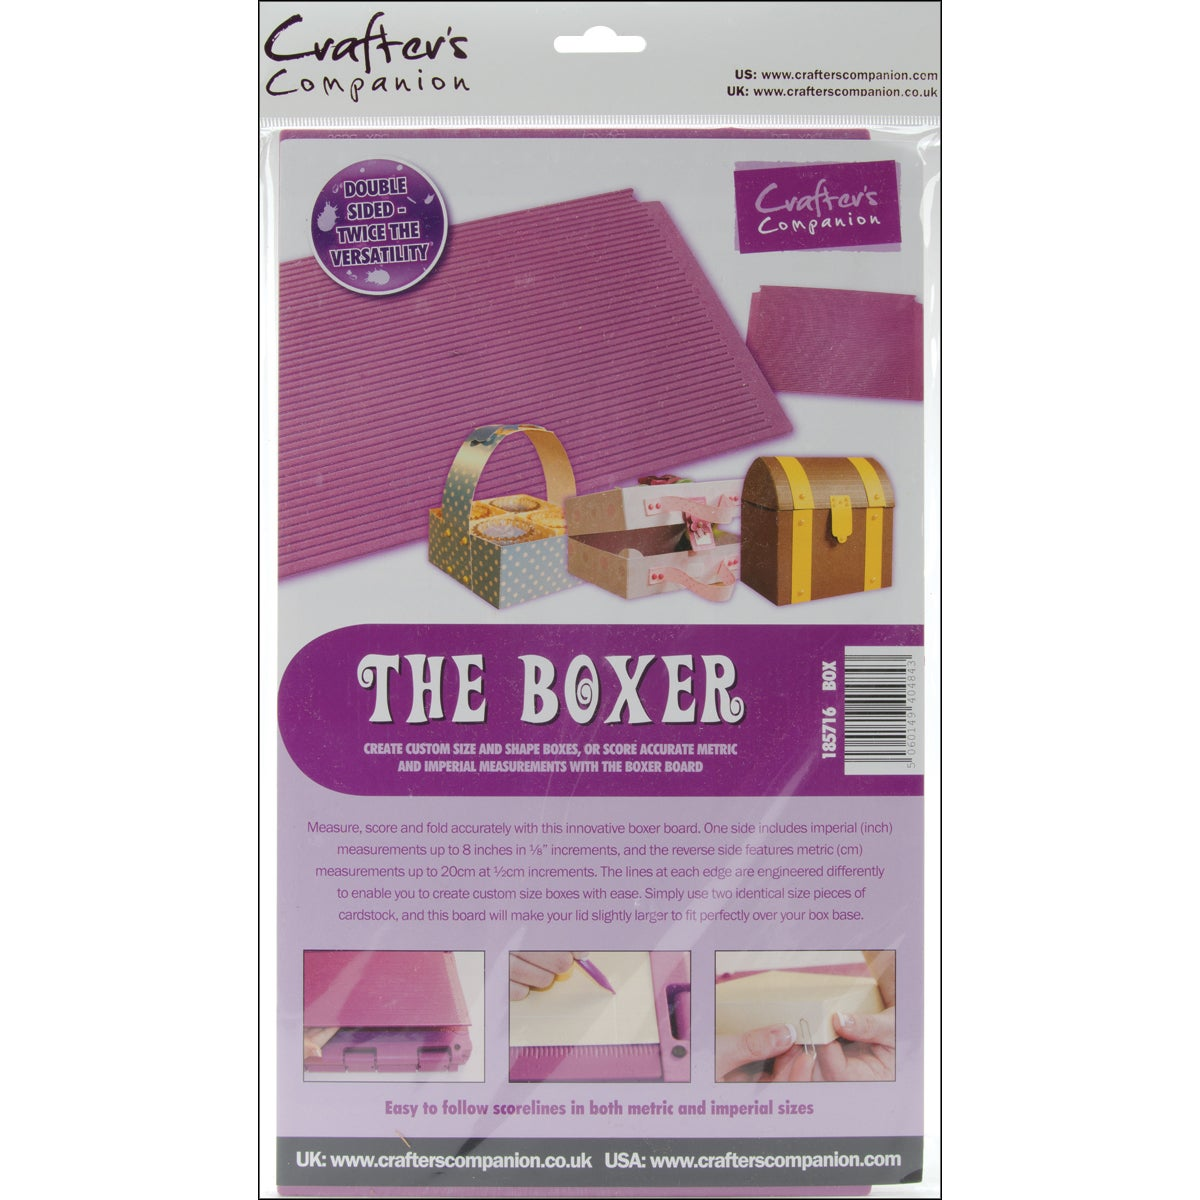 Crafter's Companion The Boxer Custom Box Maker